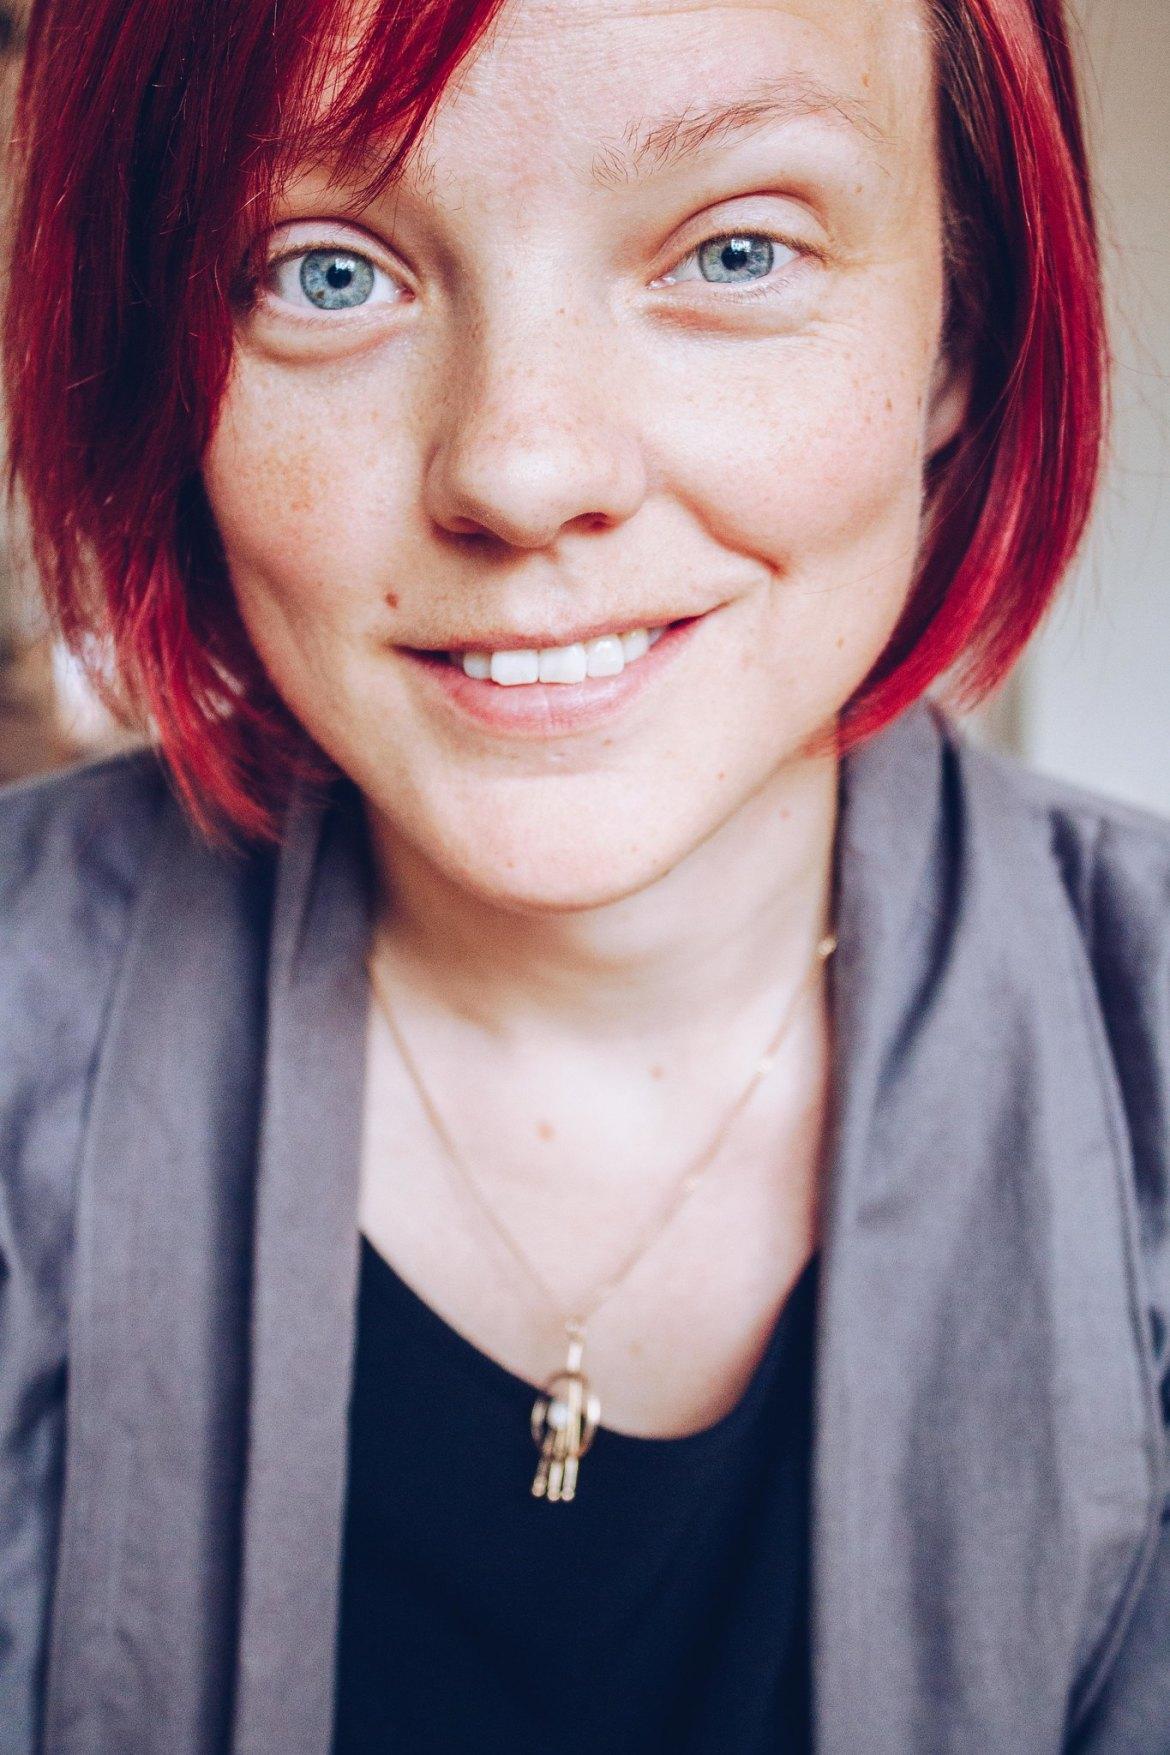 Kaftan - Sybingo 2018 - reaktionista.se